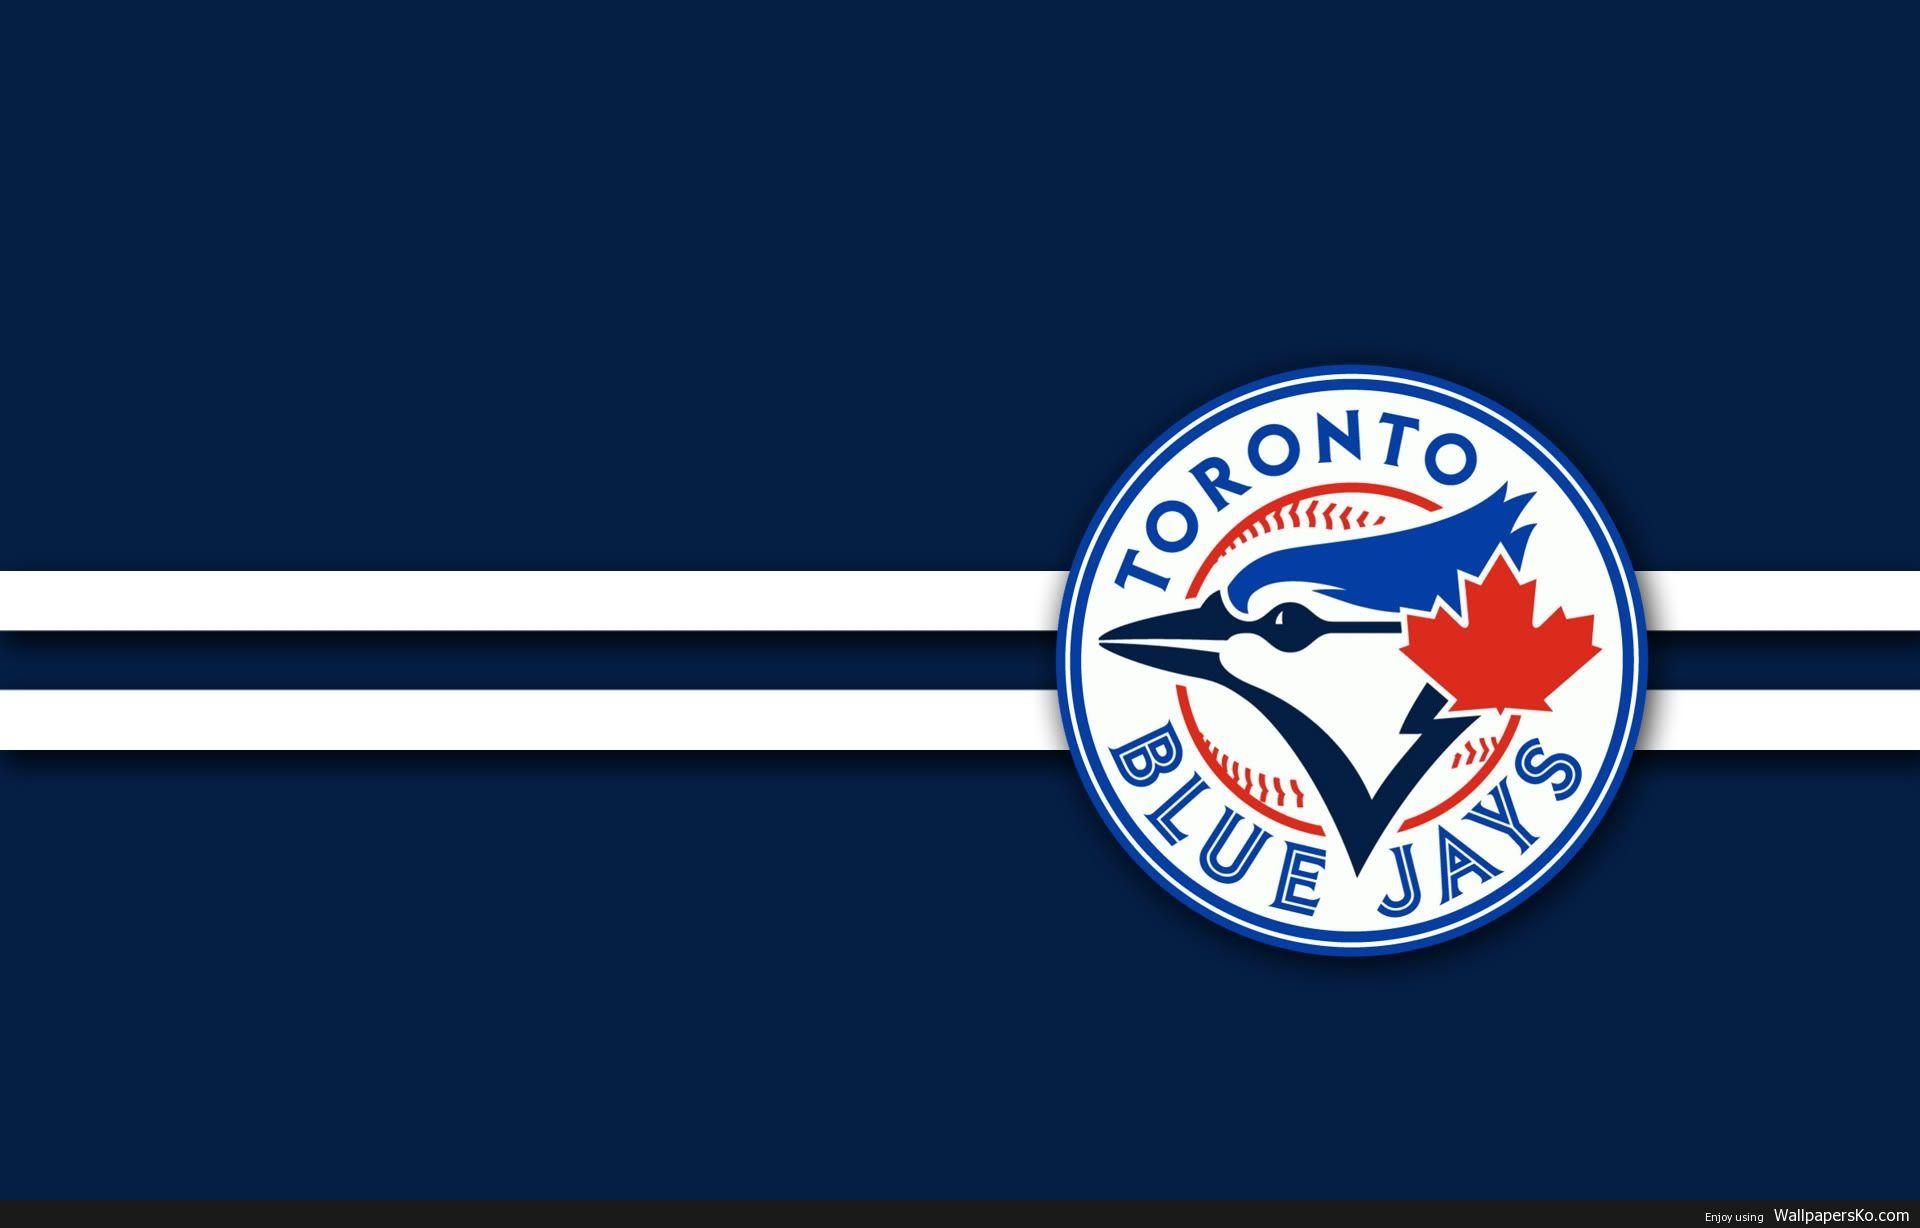 Pin By Julia On Blue Jays Blue Jays Toronto Blue Jays Team Banner